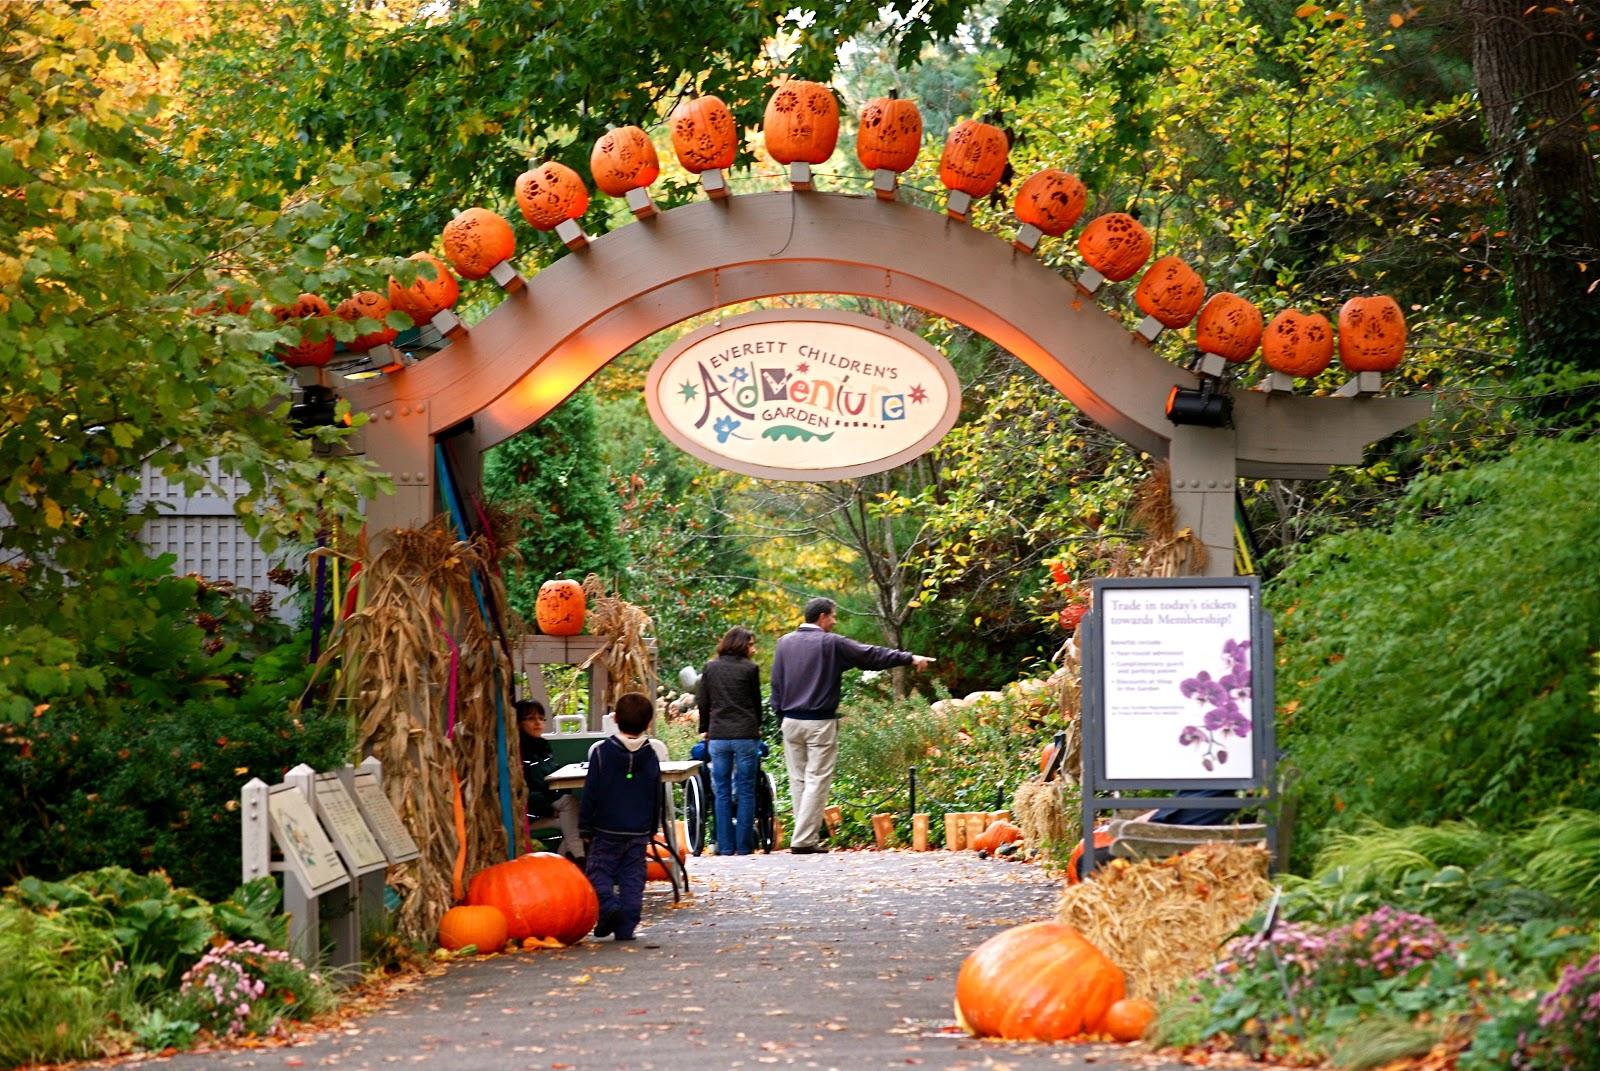 Nyc Nyc Haunted Pumpkin Garden At The New York Botanical Garden